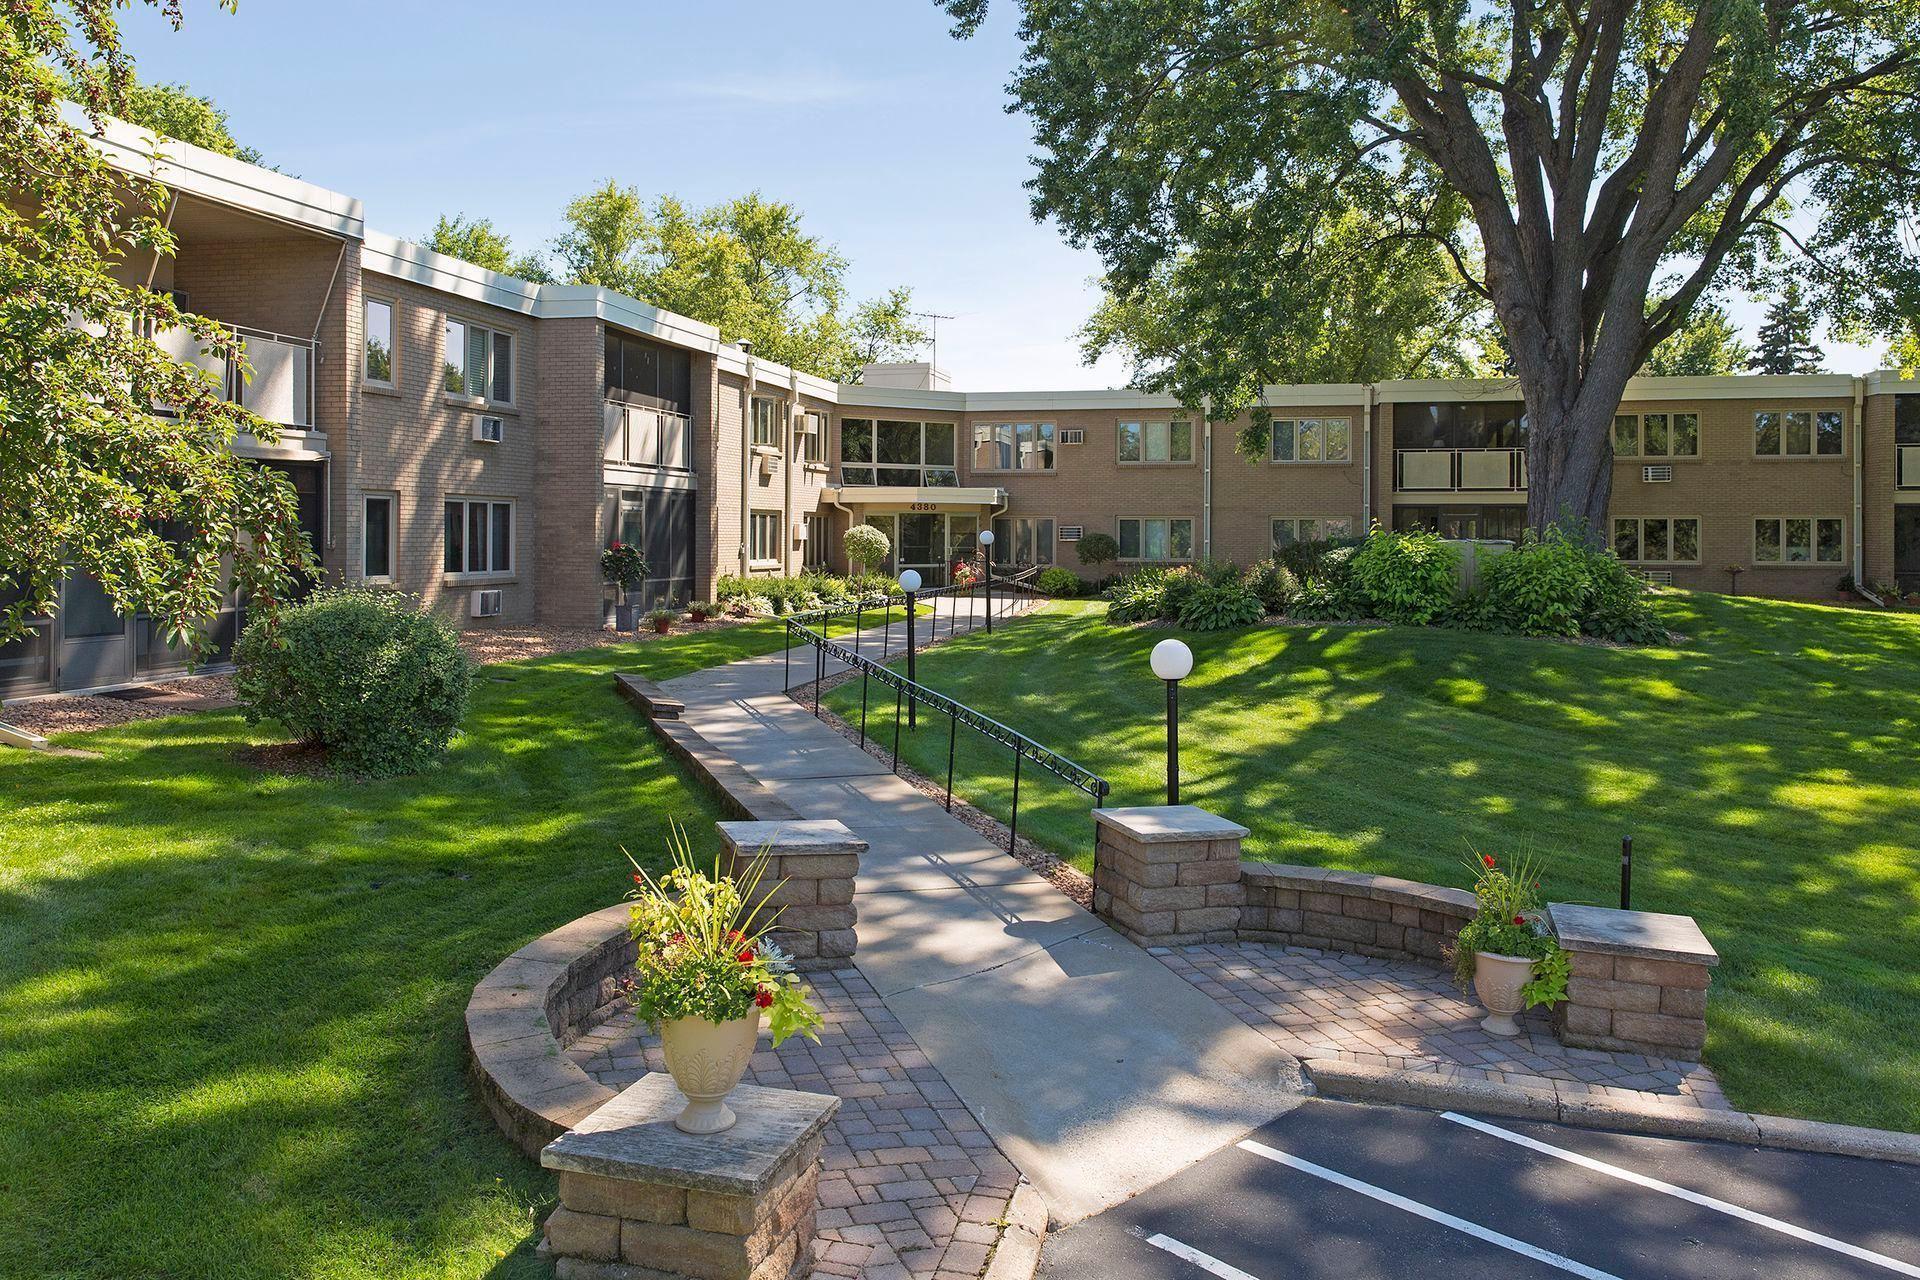 Photo of 4380 Brookside Court #203, Edina, MN 55436 (MLS # 6101897)